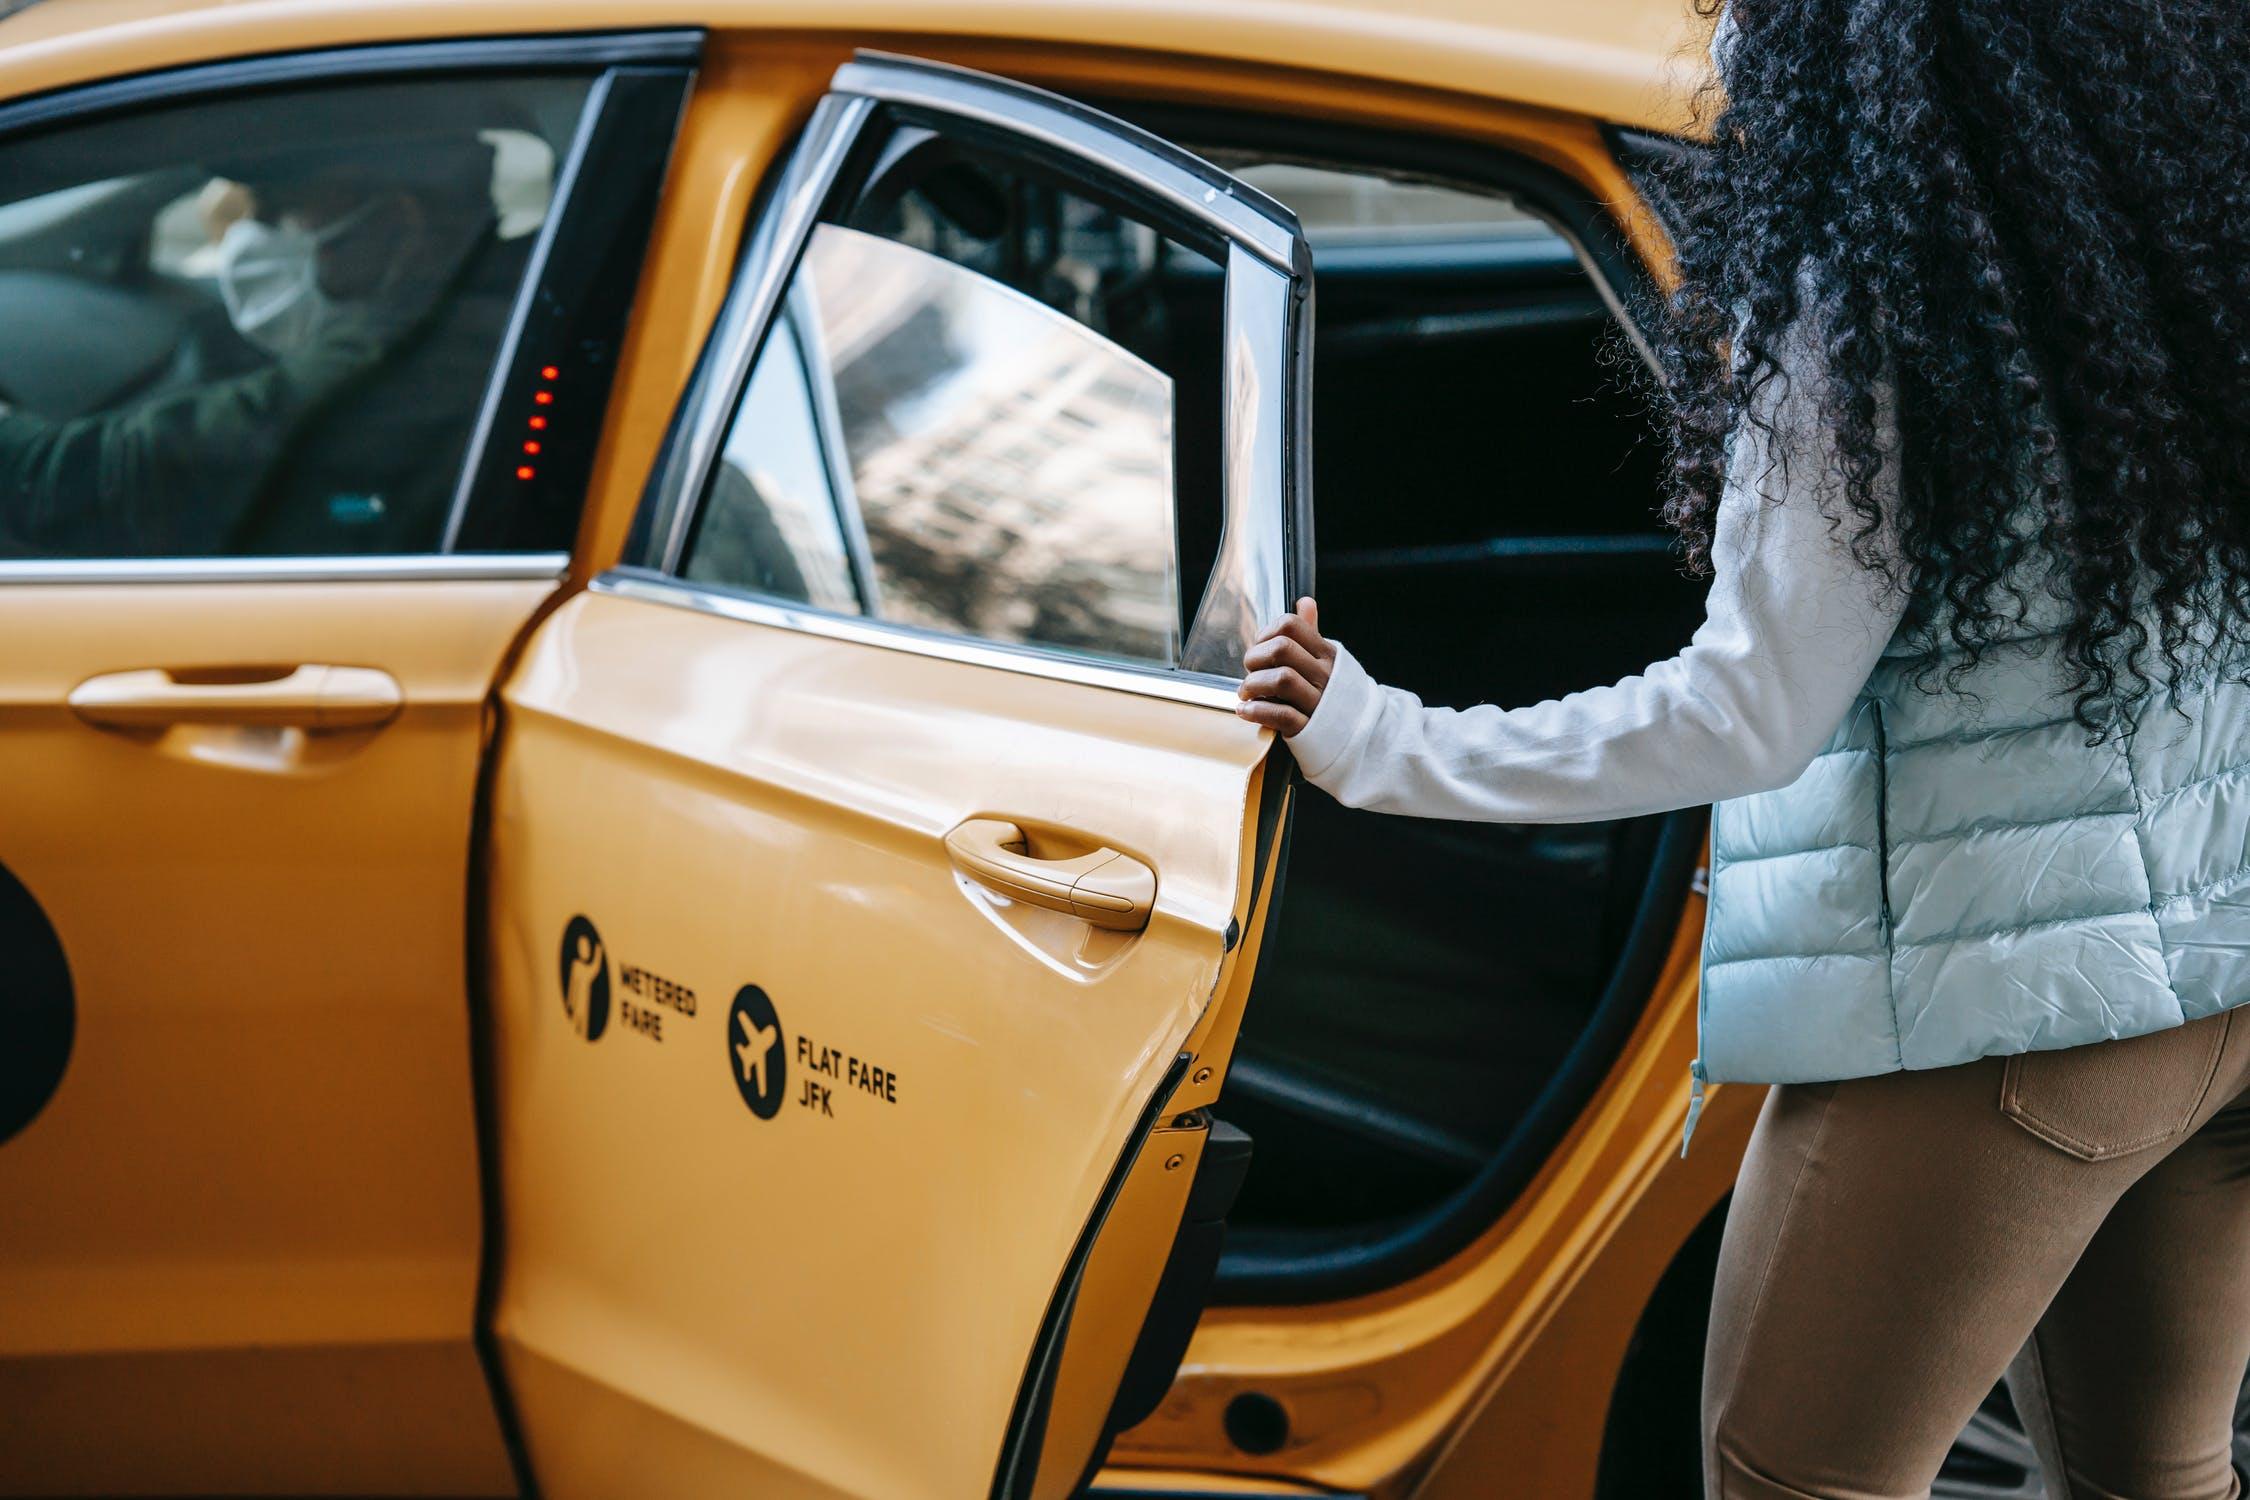 Black woman entering cab